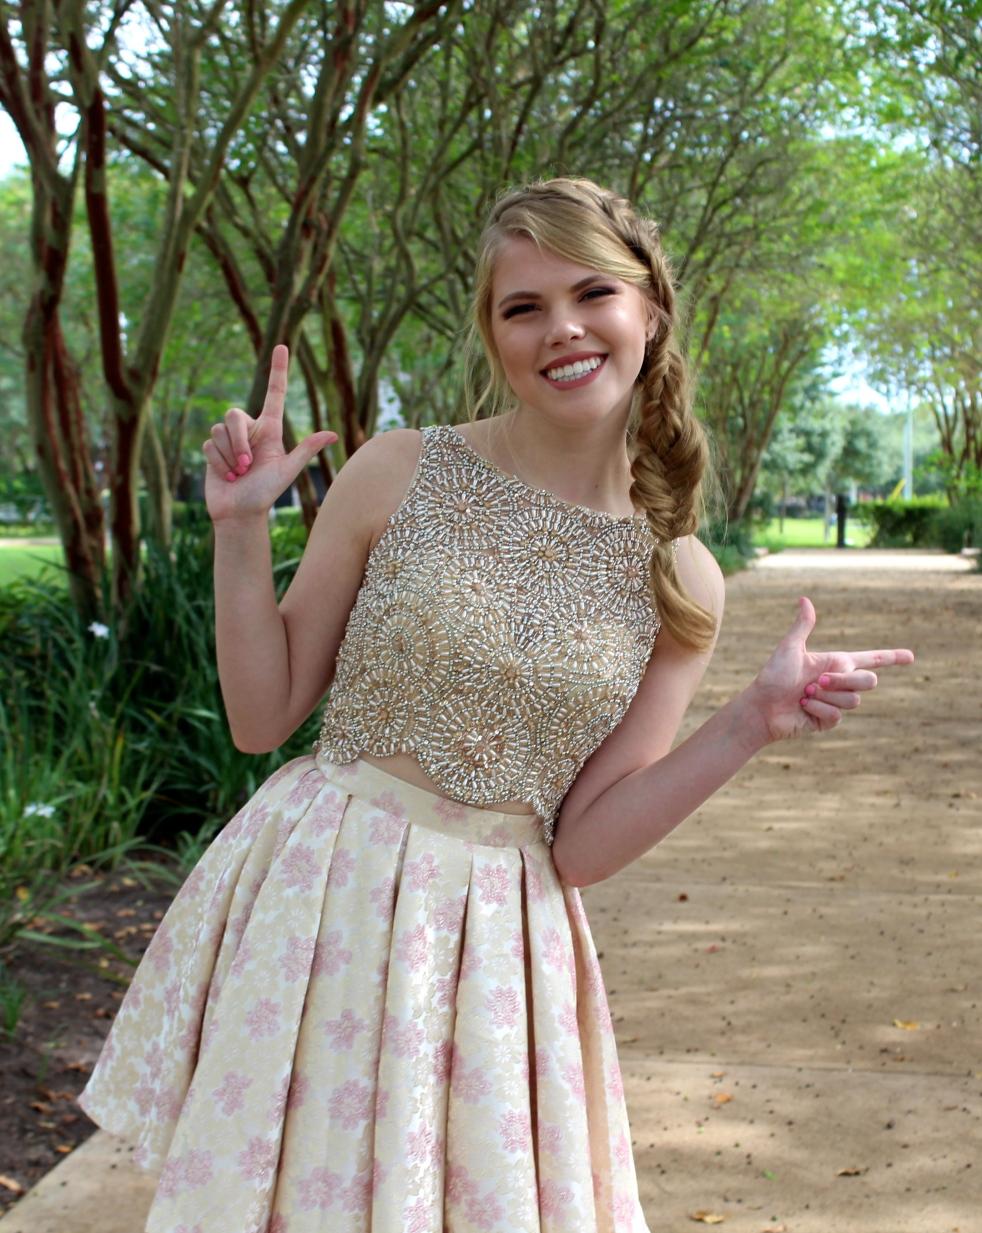 Abbie Seay, incoming Fall 2017 Texas Tech University student